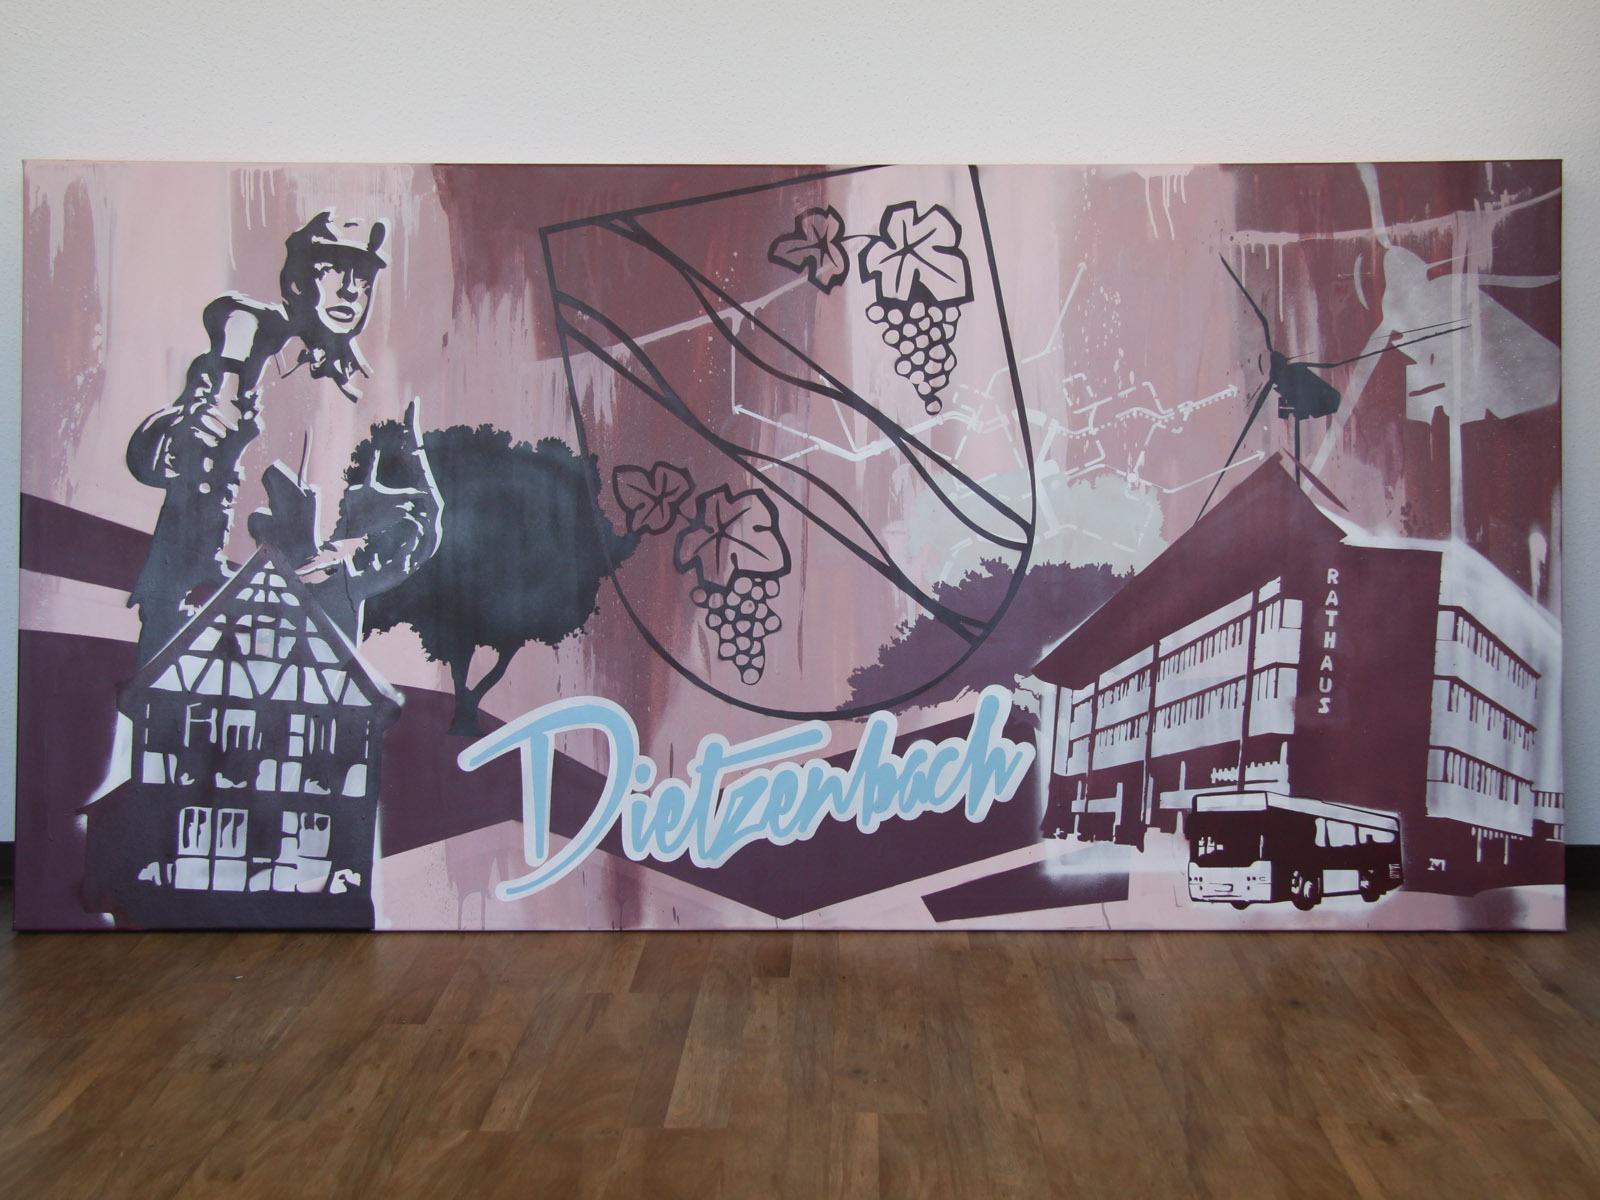 graffitiauftrag-graffitikuenstler-artmos4-gemeinde-dietzenbach-leinwand-illustrativ